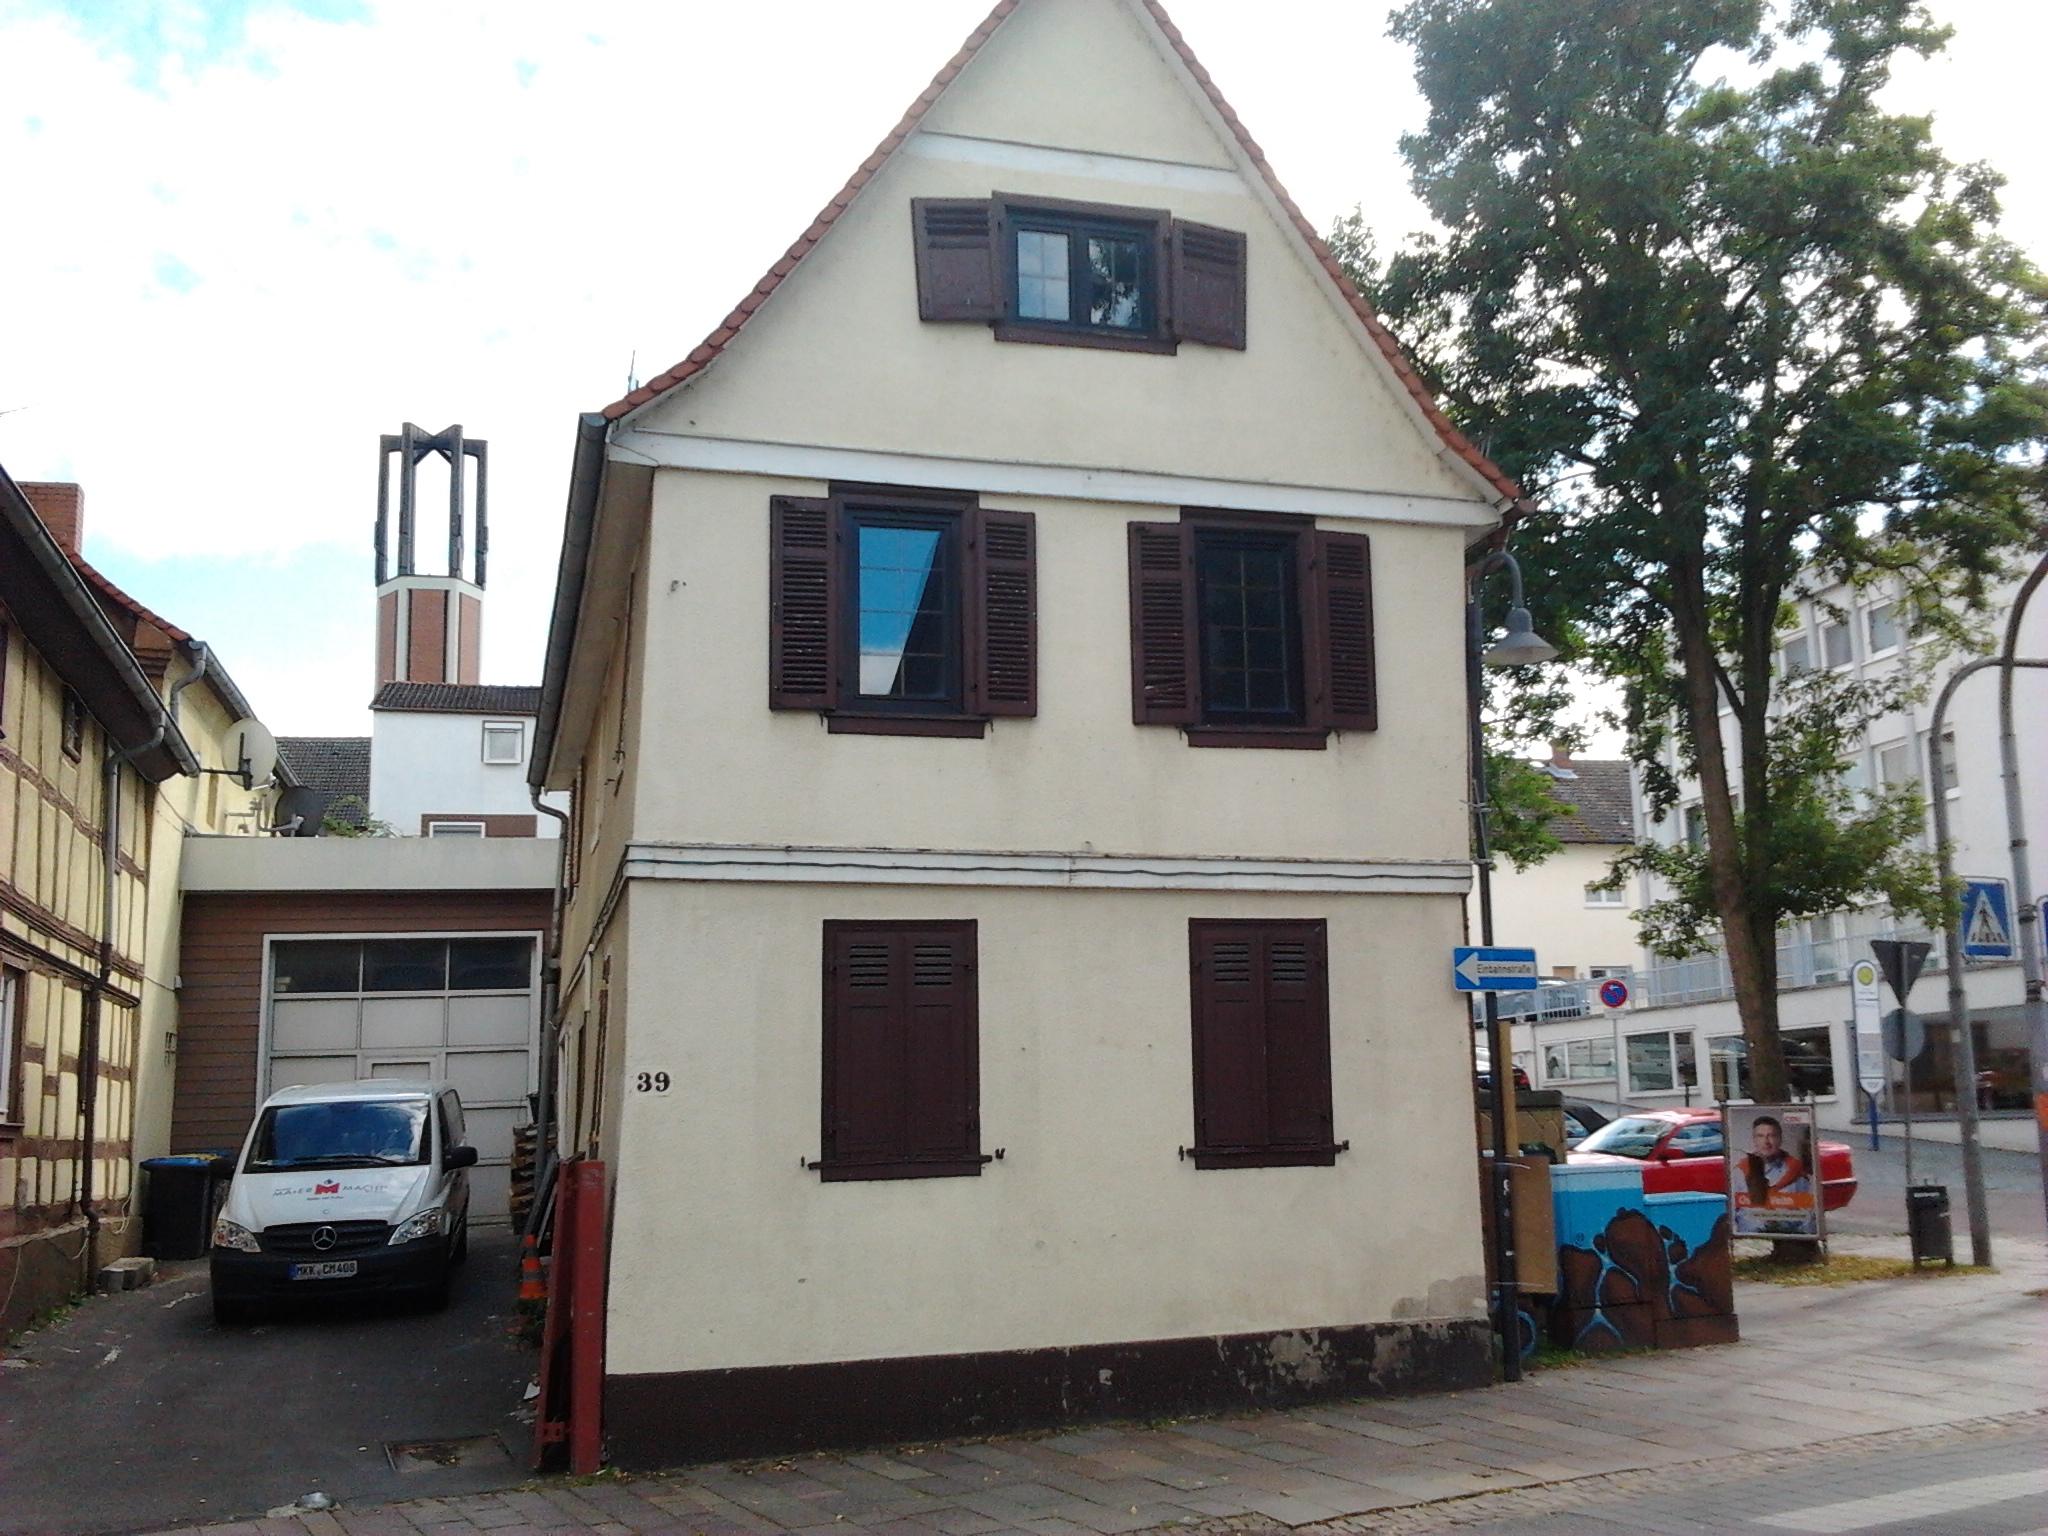 Frankfurter Bad file bad vilbel frankfurter str 39 jpg wikimedia commons